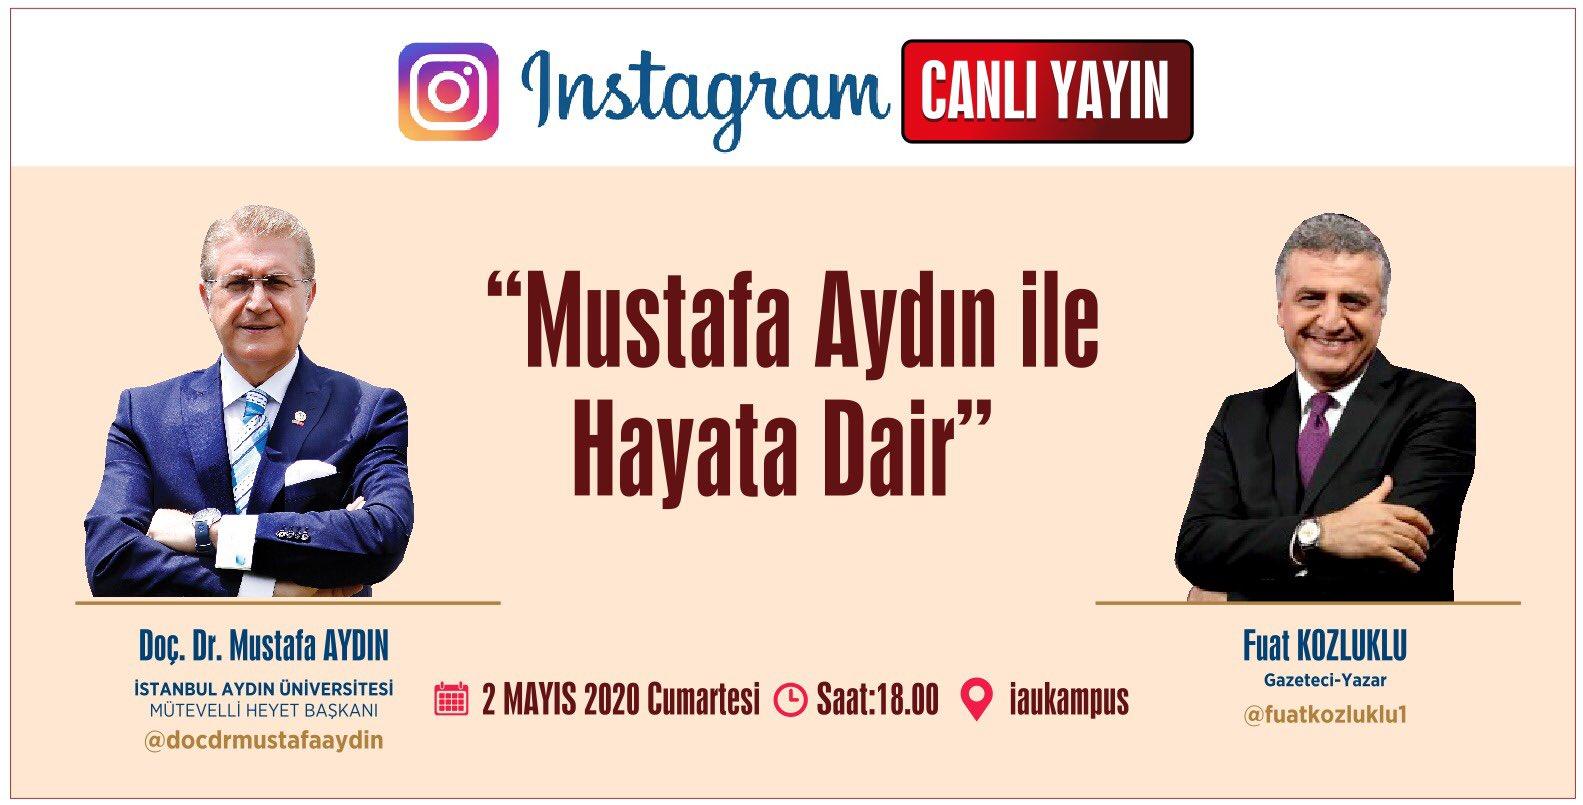 https://mustafaaydin.com/wp-content/uploads/2020/06/FUAT-KOZLUKLU.jpg